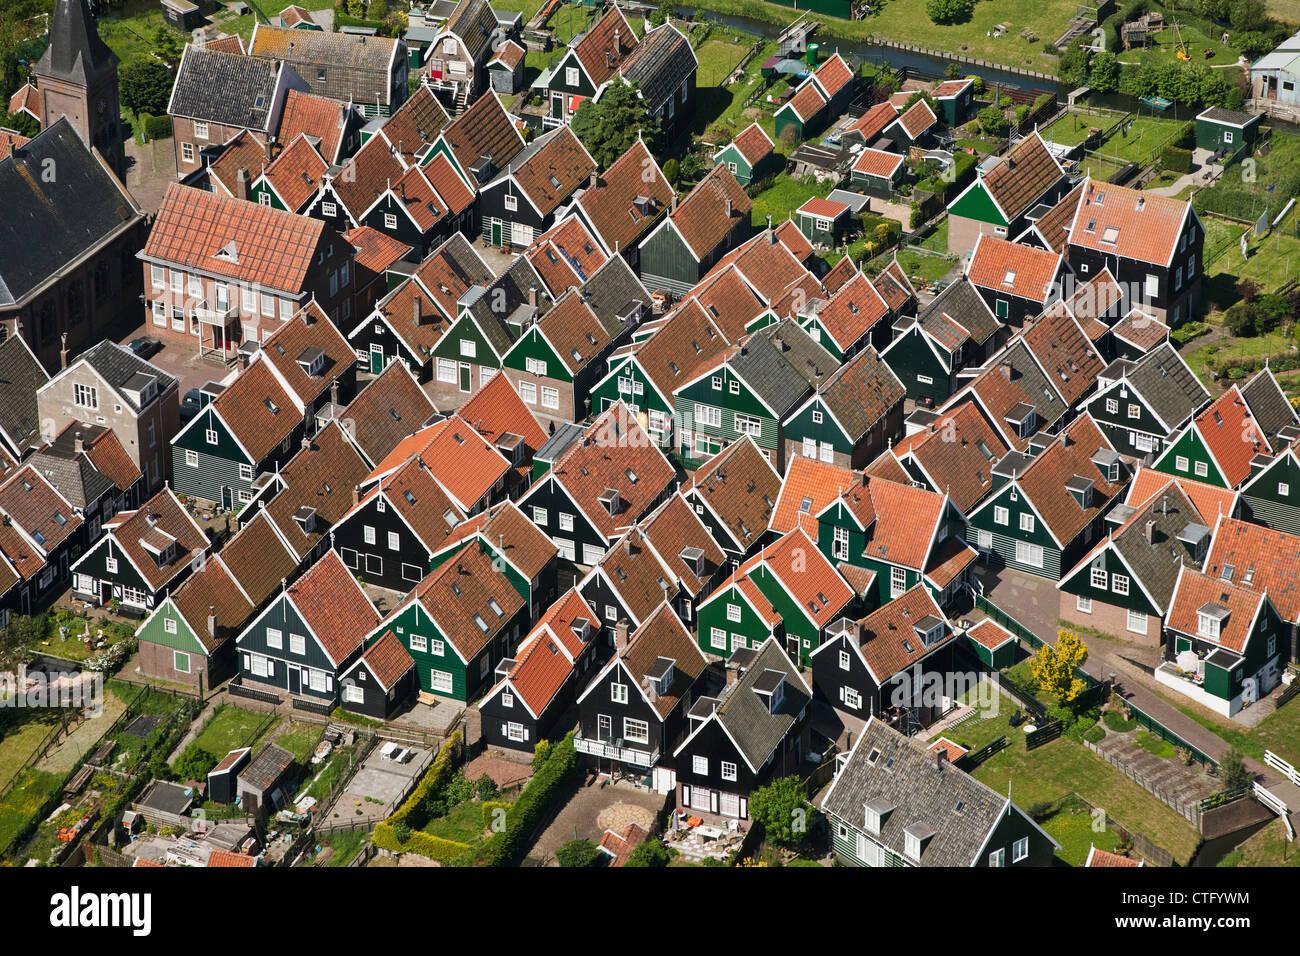 The Netherlands, Marken, Aerial. Village. - Stock Image